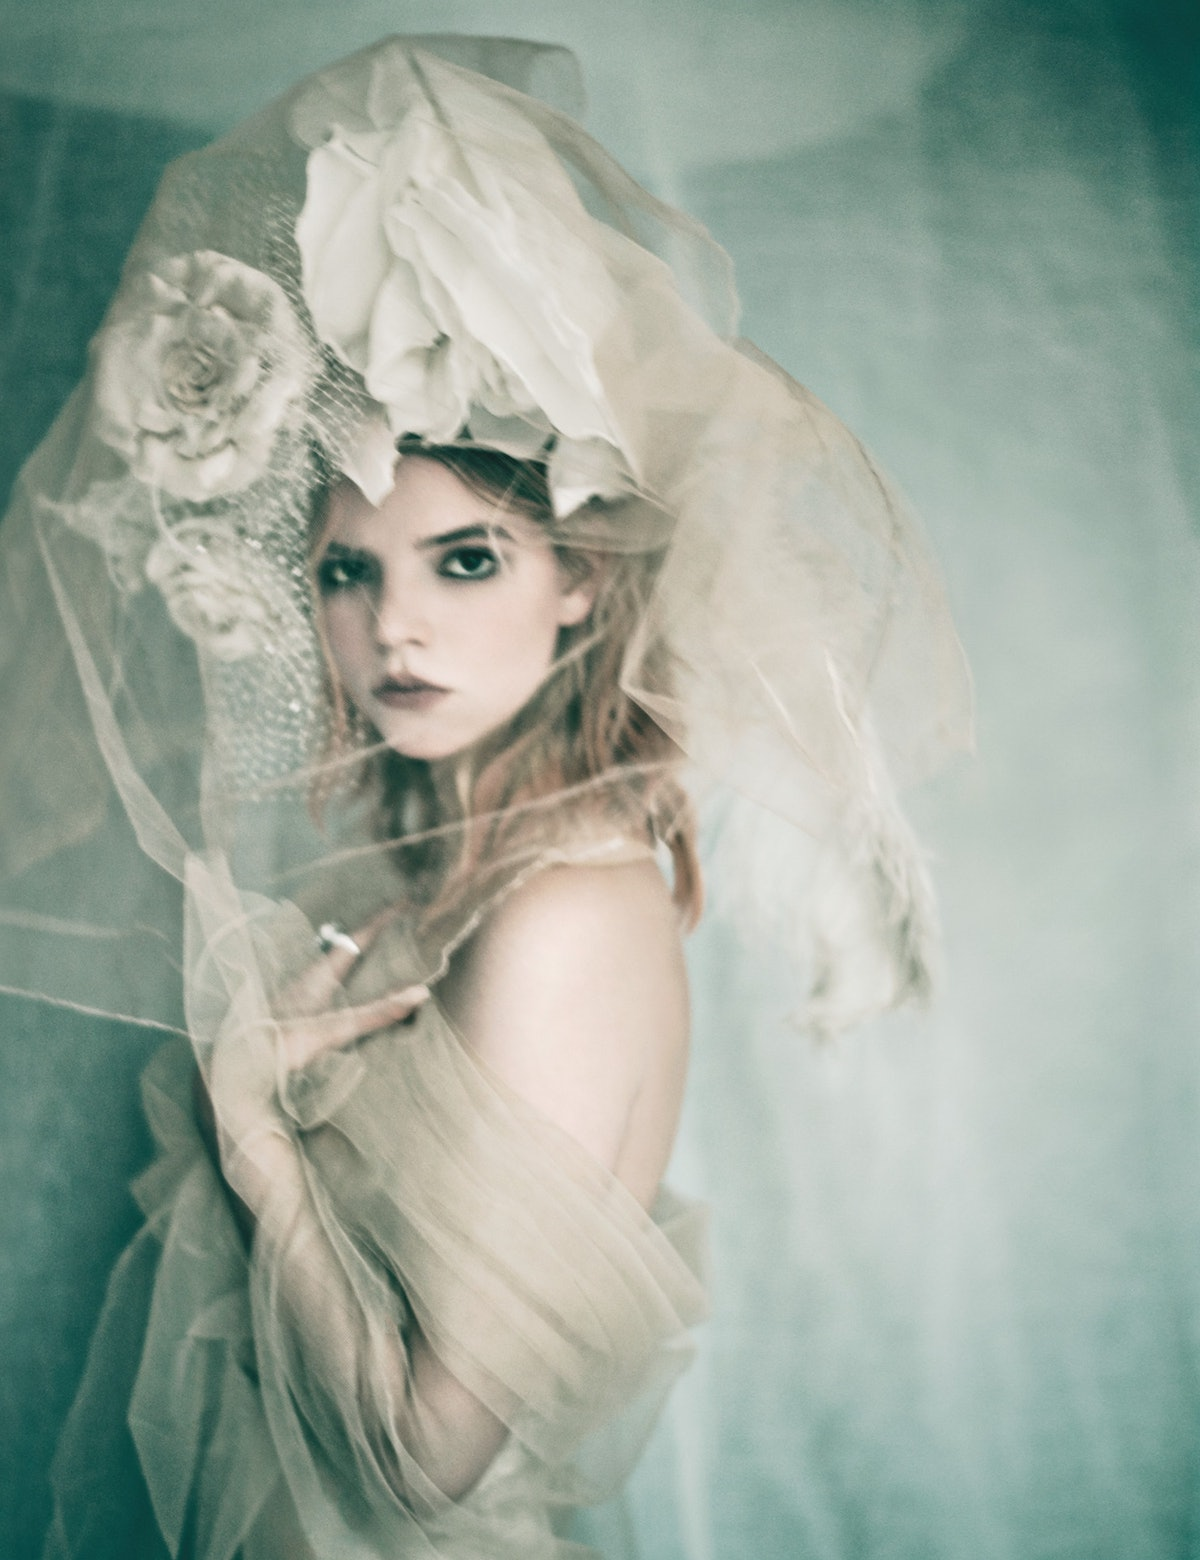 0417.w.PR.couture.image11.jpg